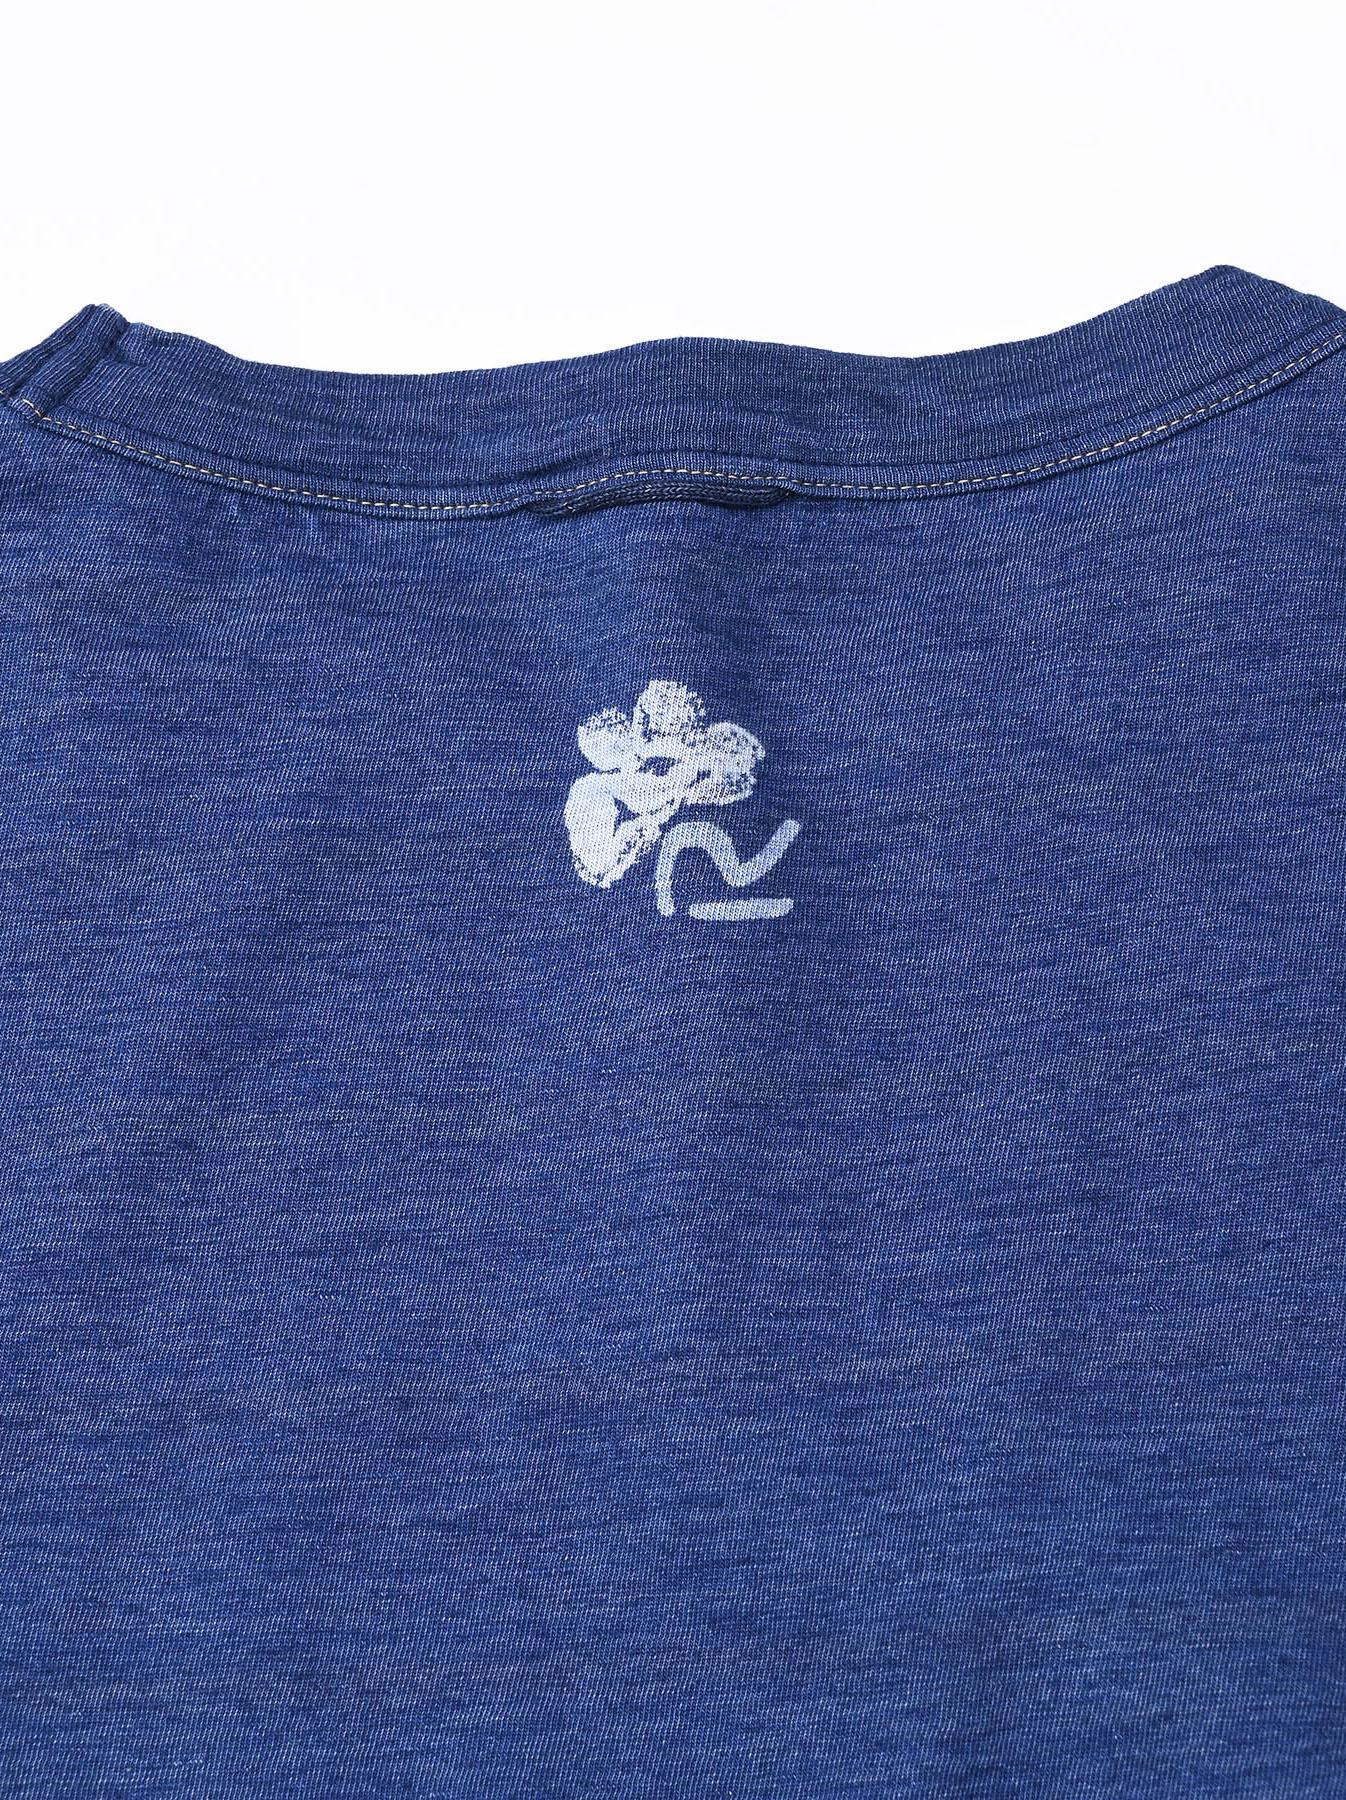 Distressed Indigo Lei Lei Print Big Slit T-shirt (0621)-9